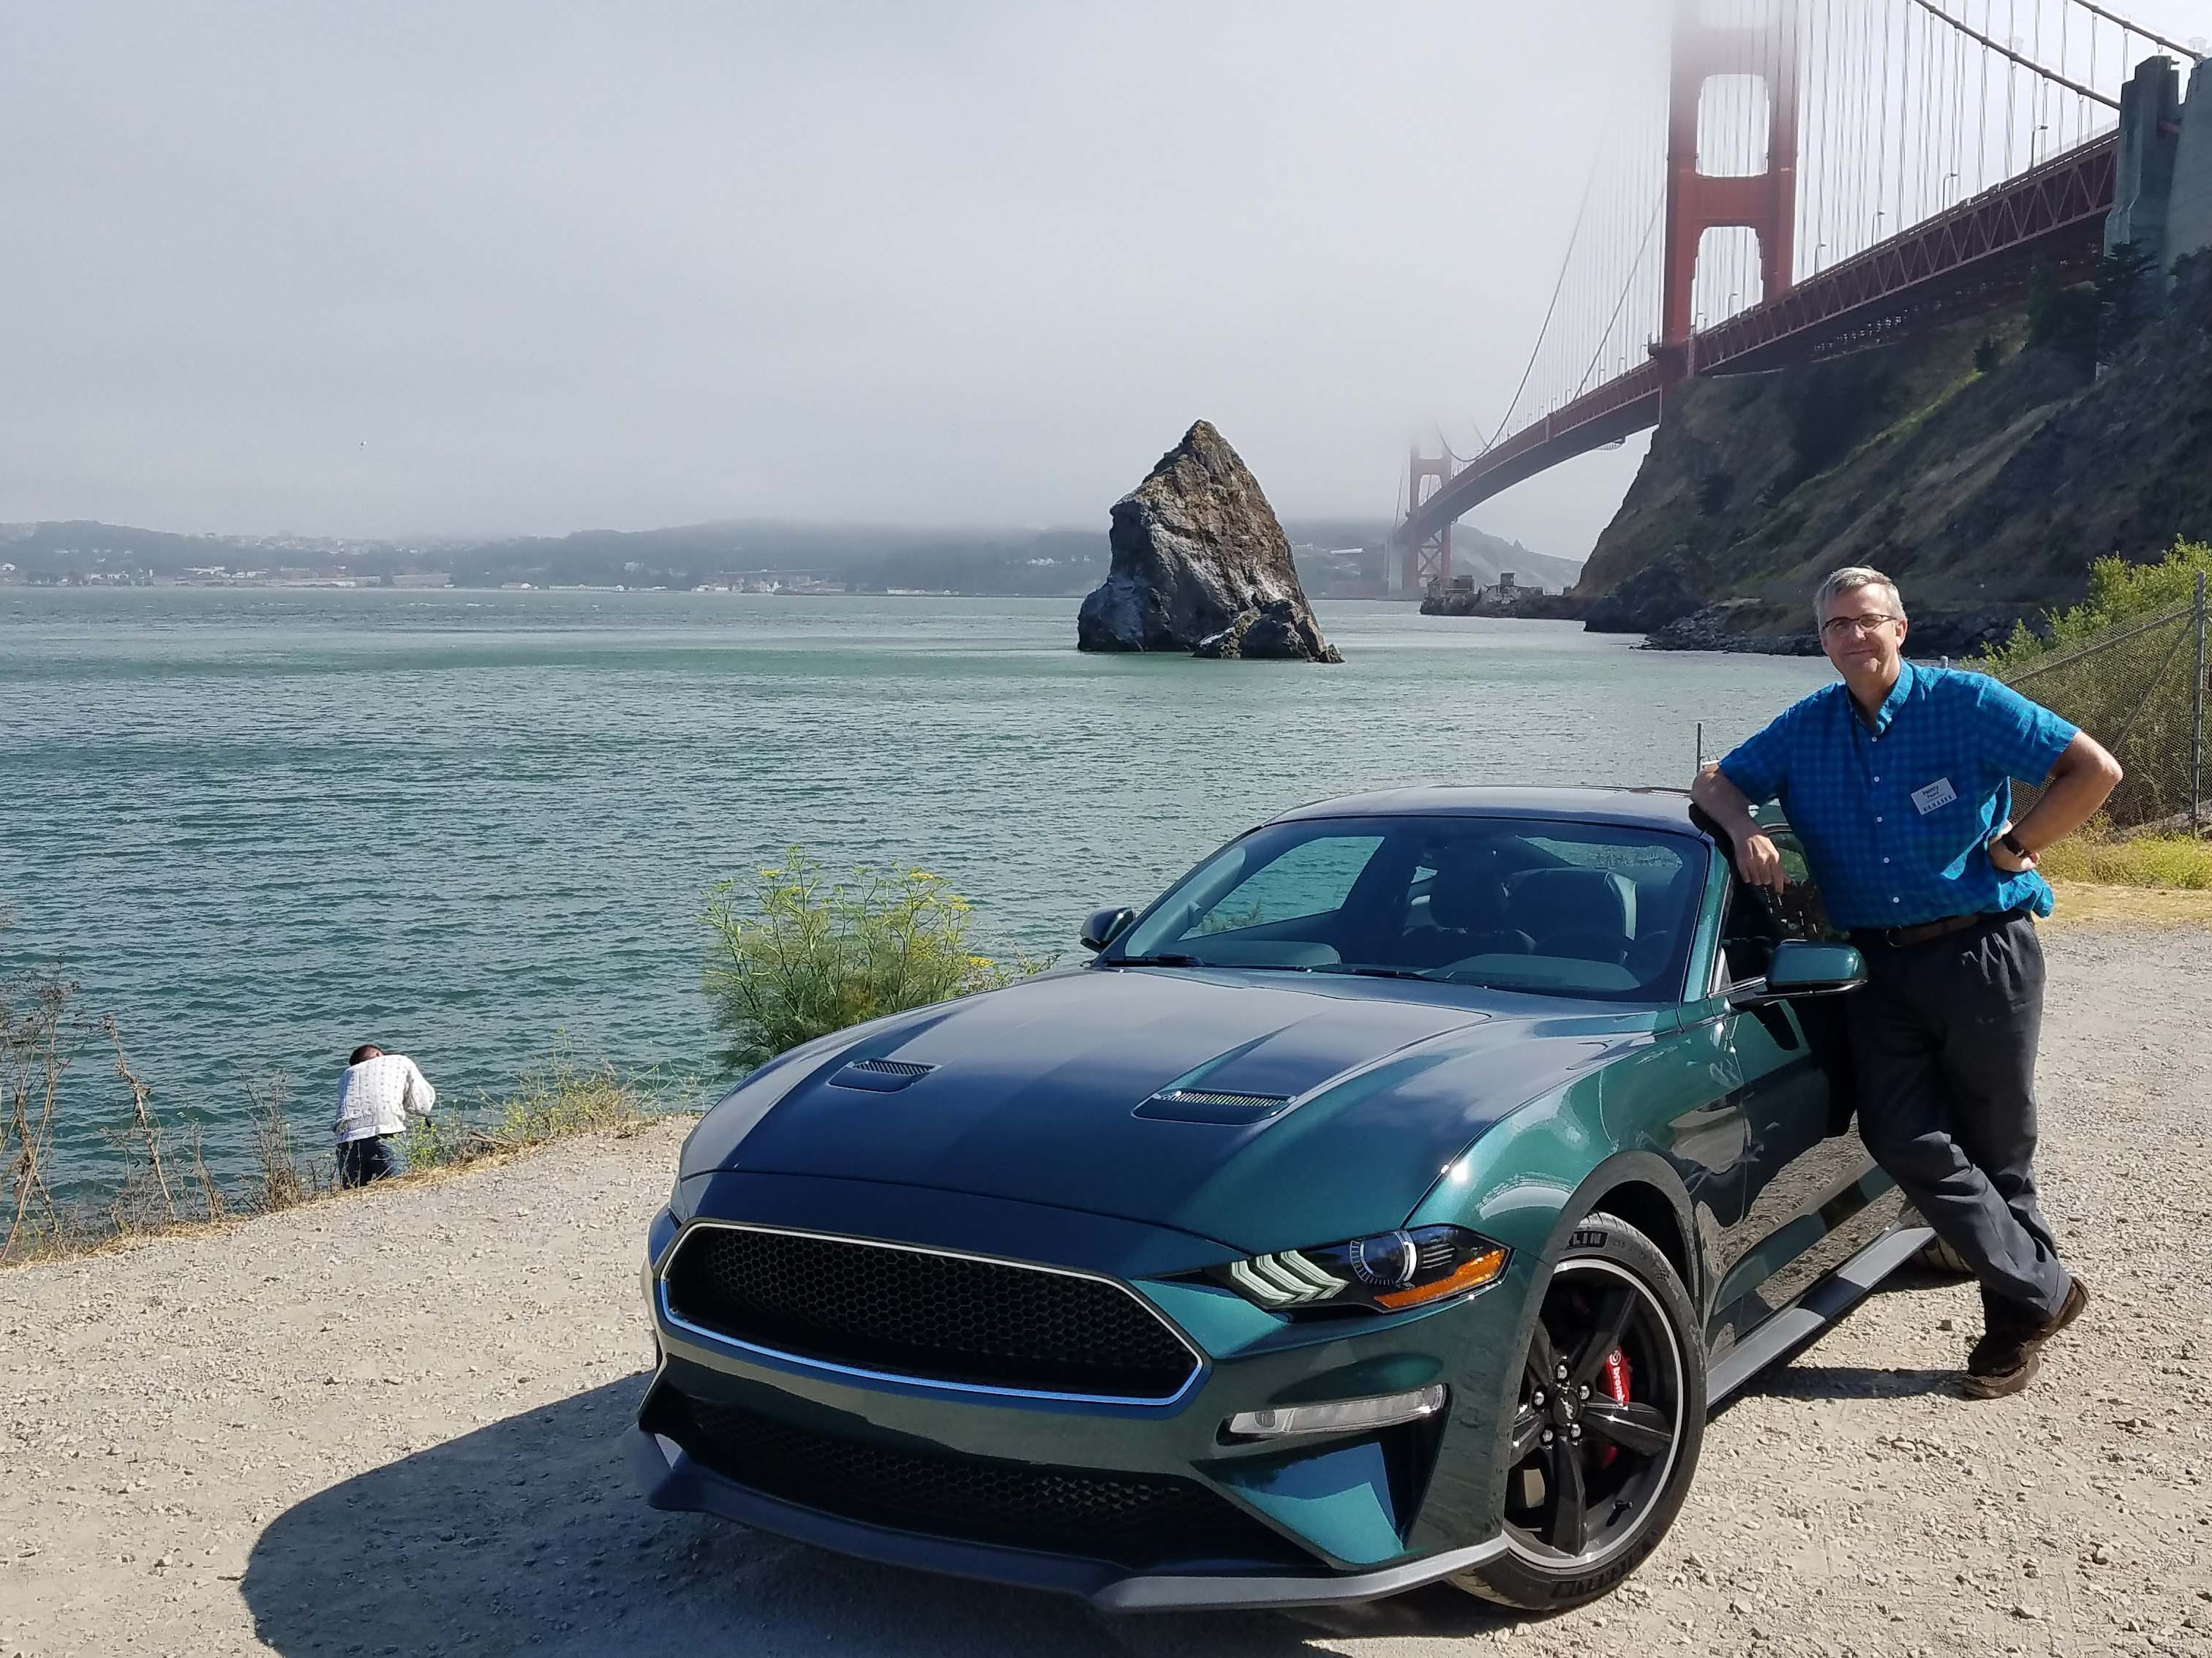 Detroit News auto critic Henry Payne followed Steve McQueen's Bullitt tire tracks around San Francisco in a new, 2019 Ford Mustang Bullitt.